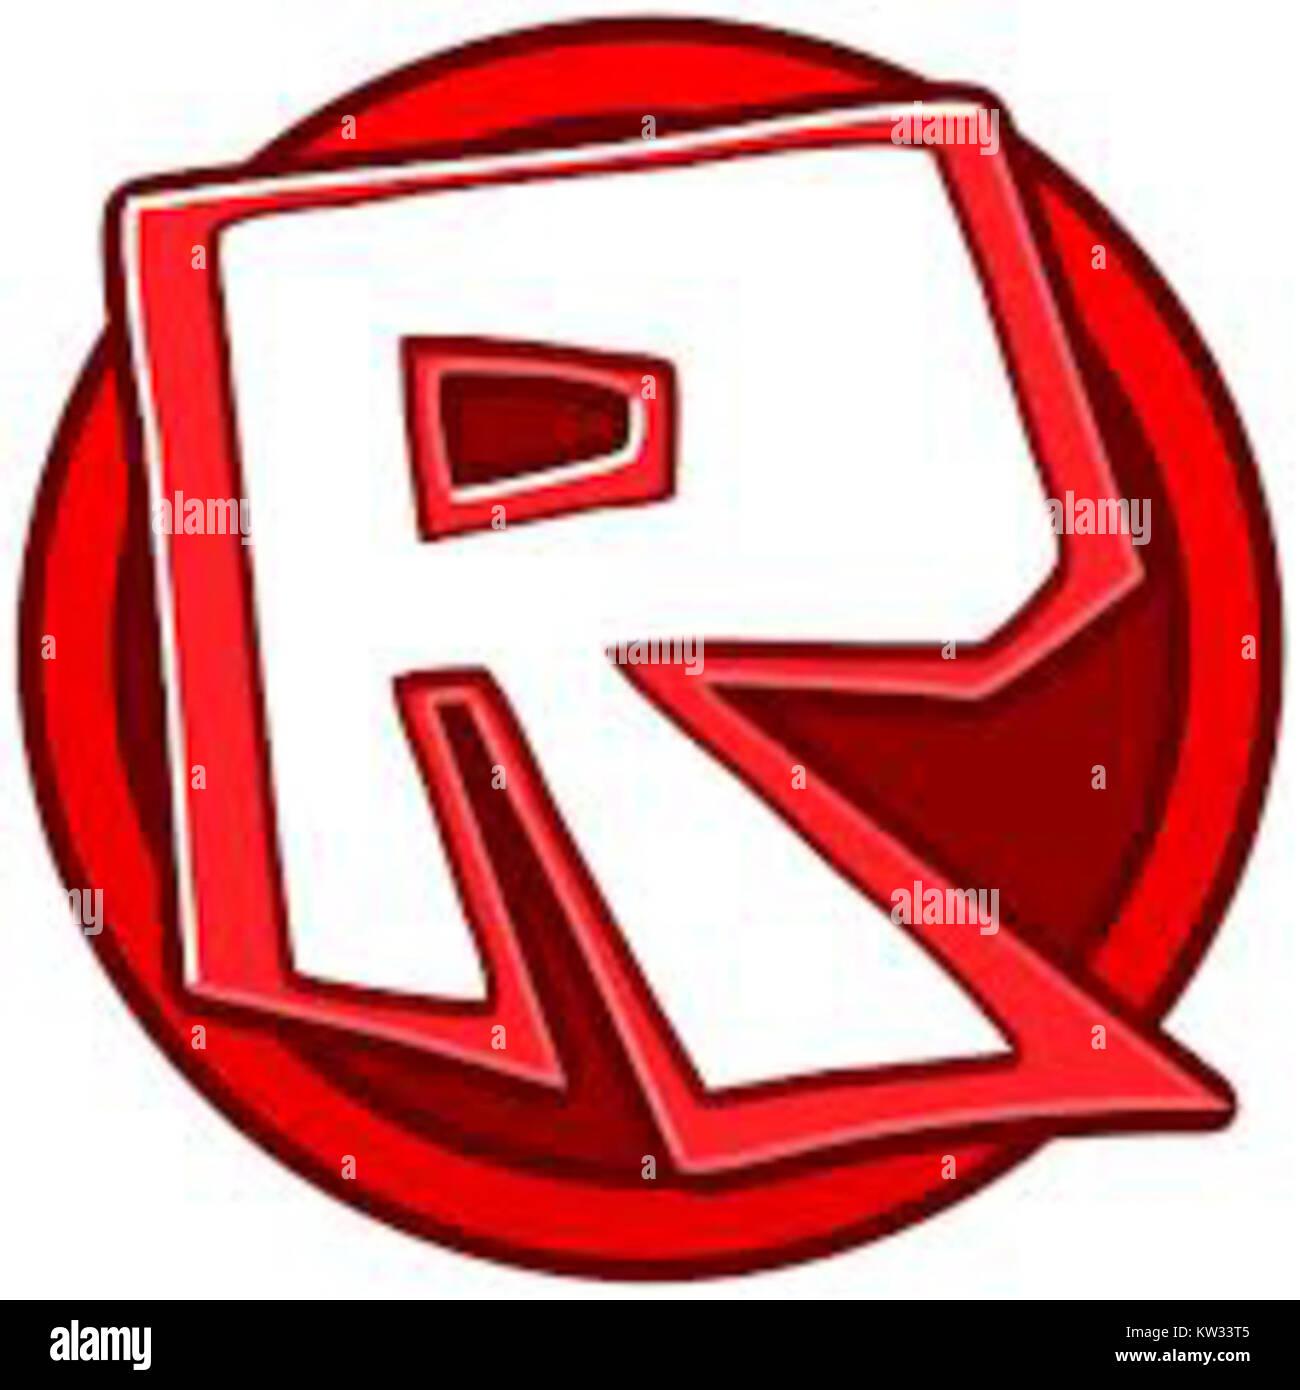 Roblox Stock Photo Alamy